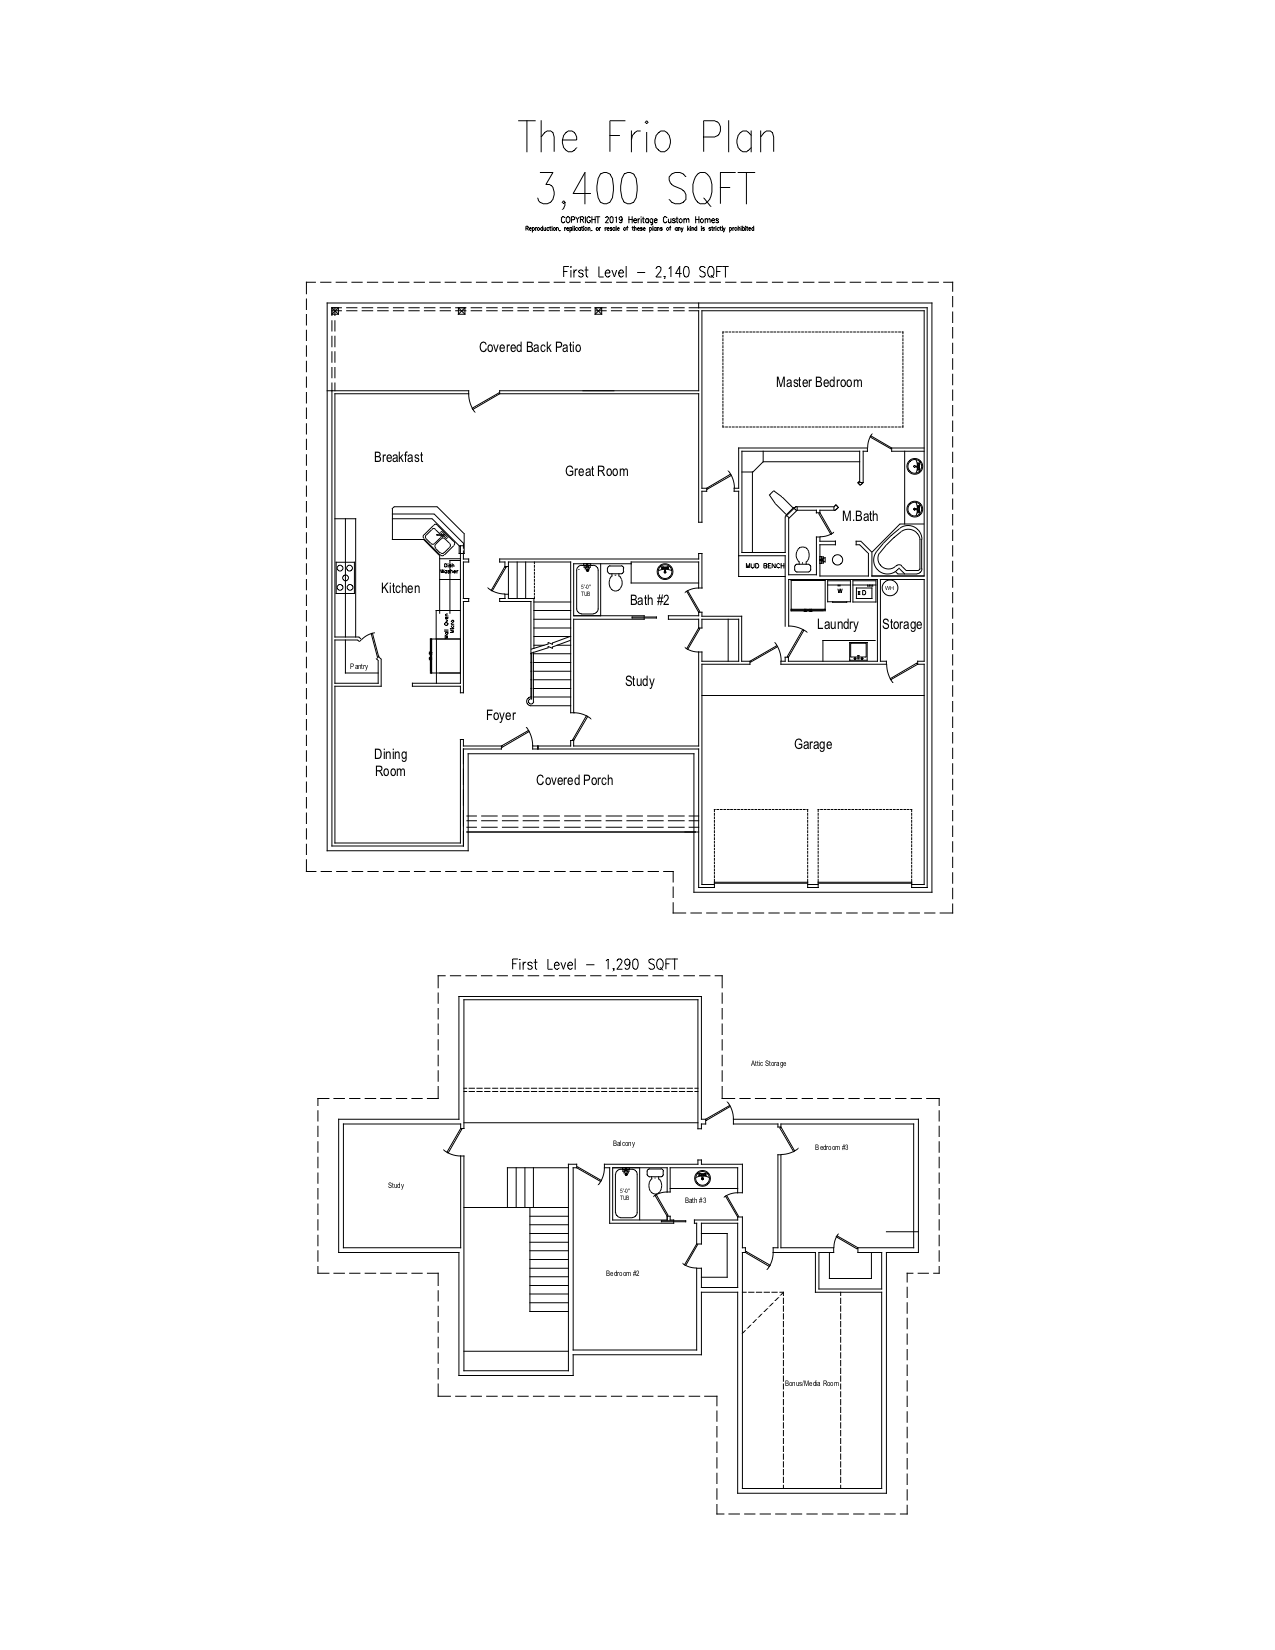 The Frio Floorplan